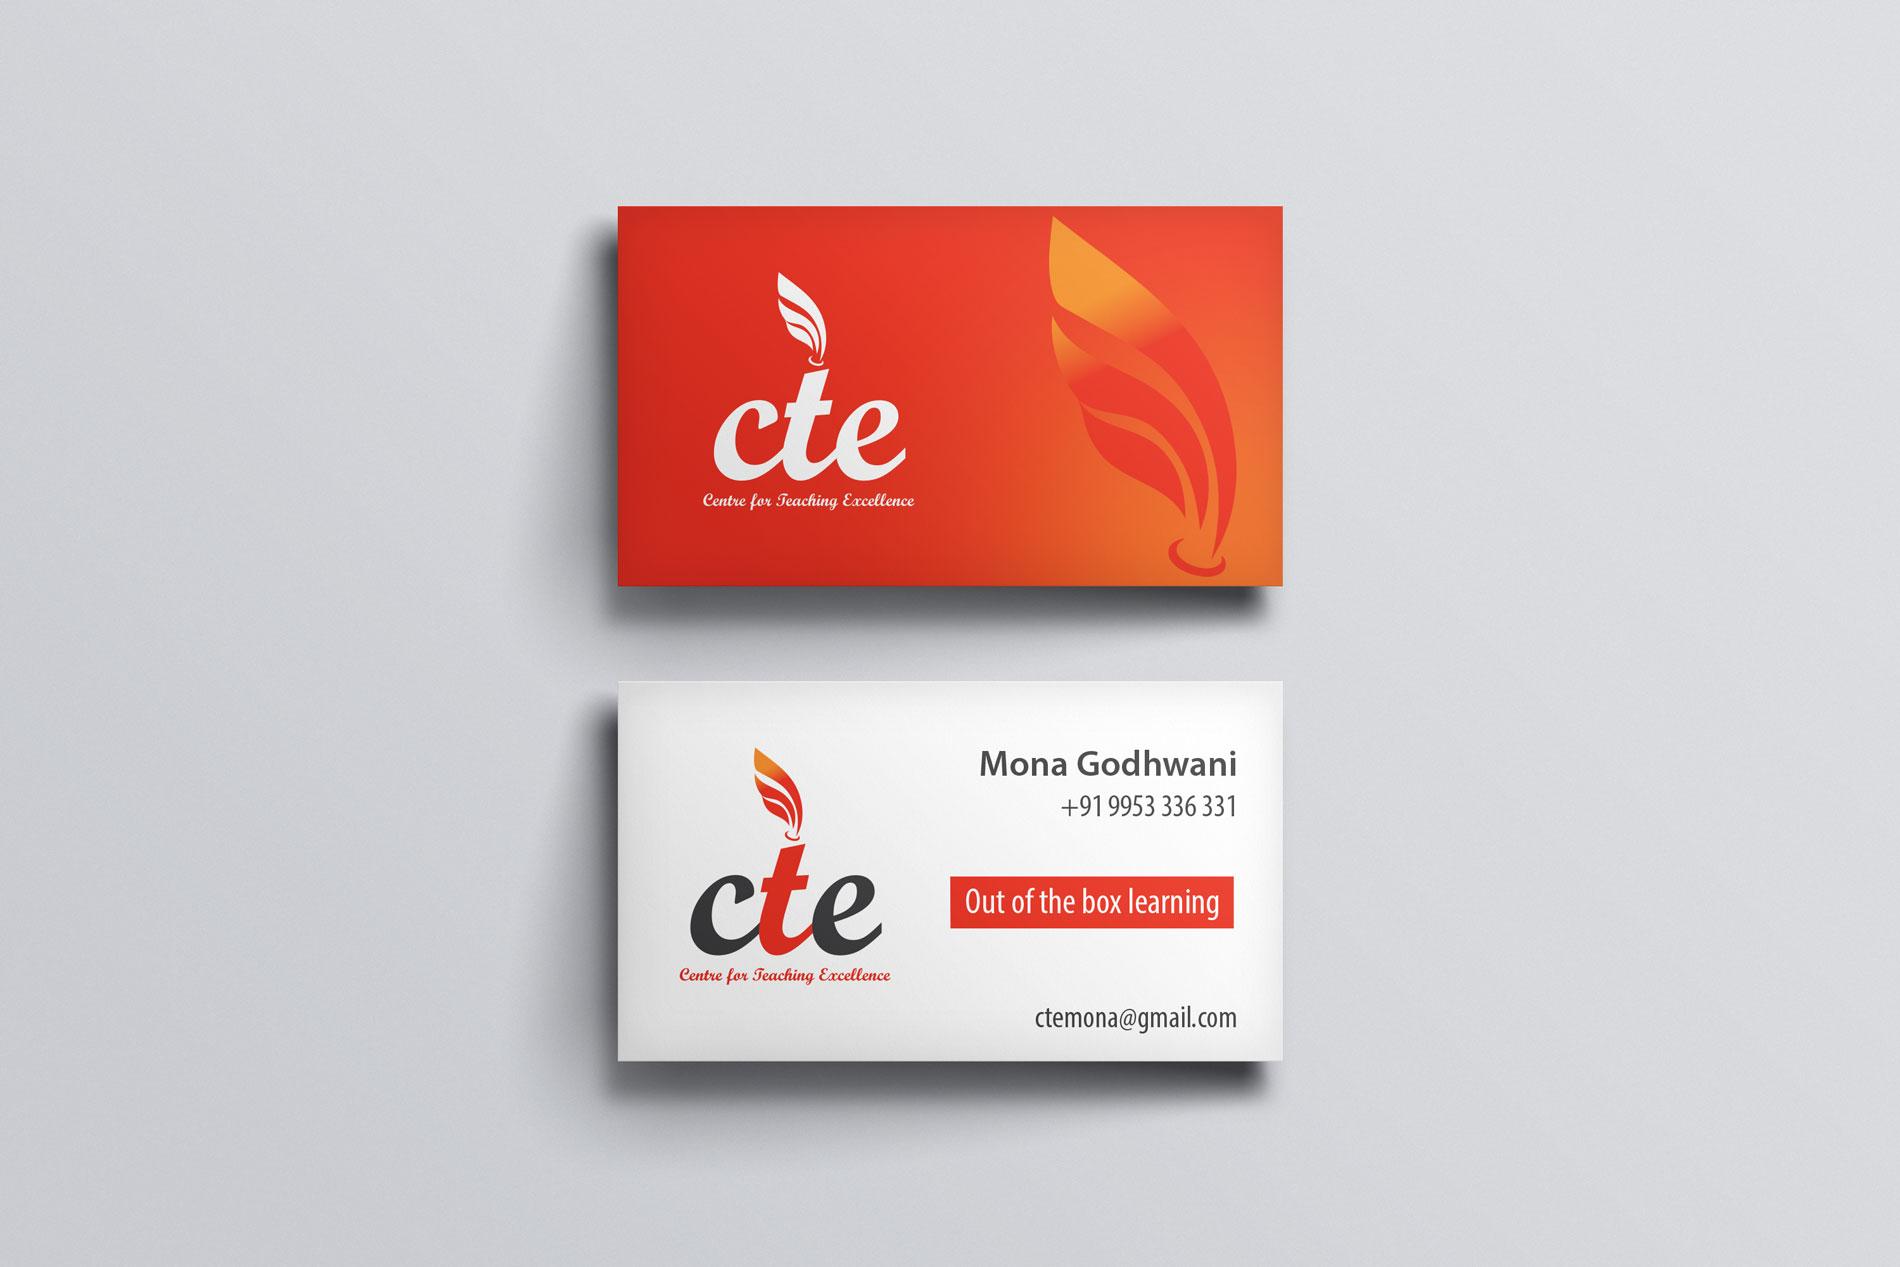 Business card design for CTE - education institute